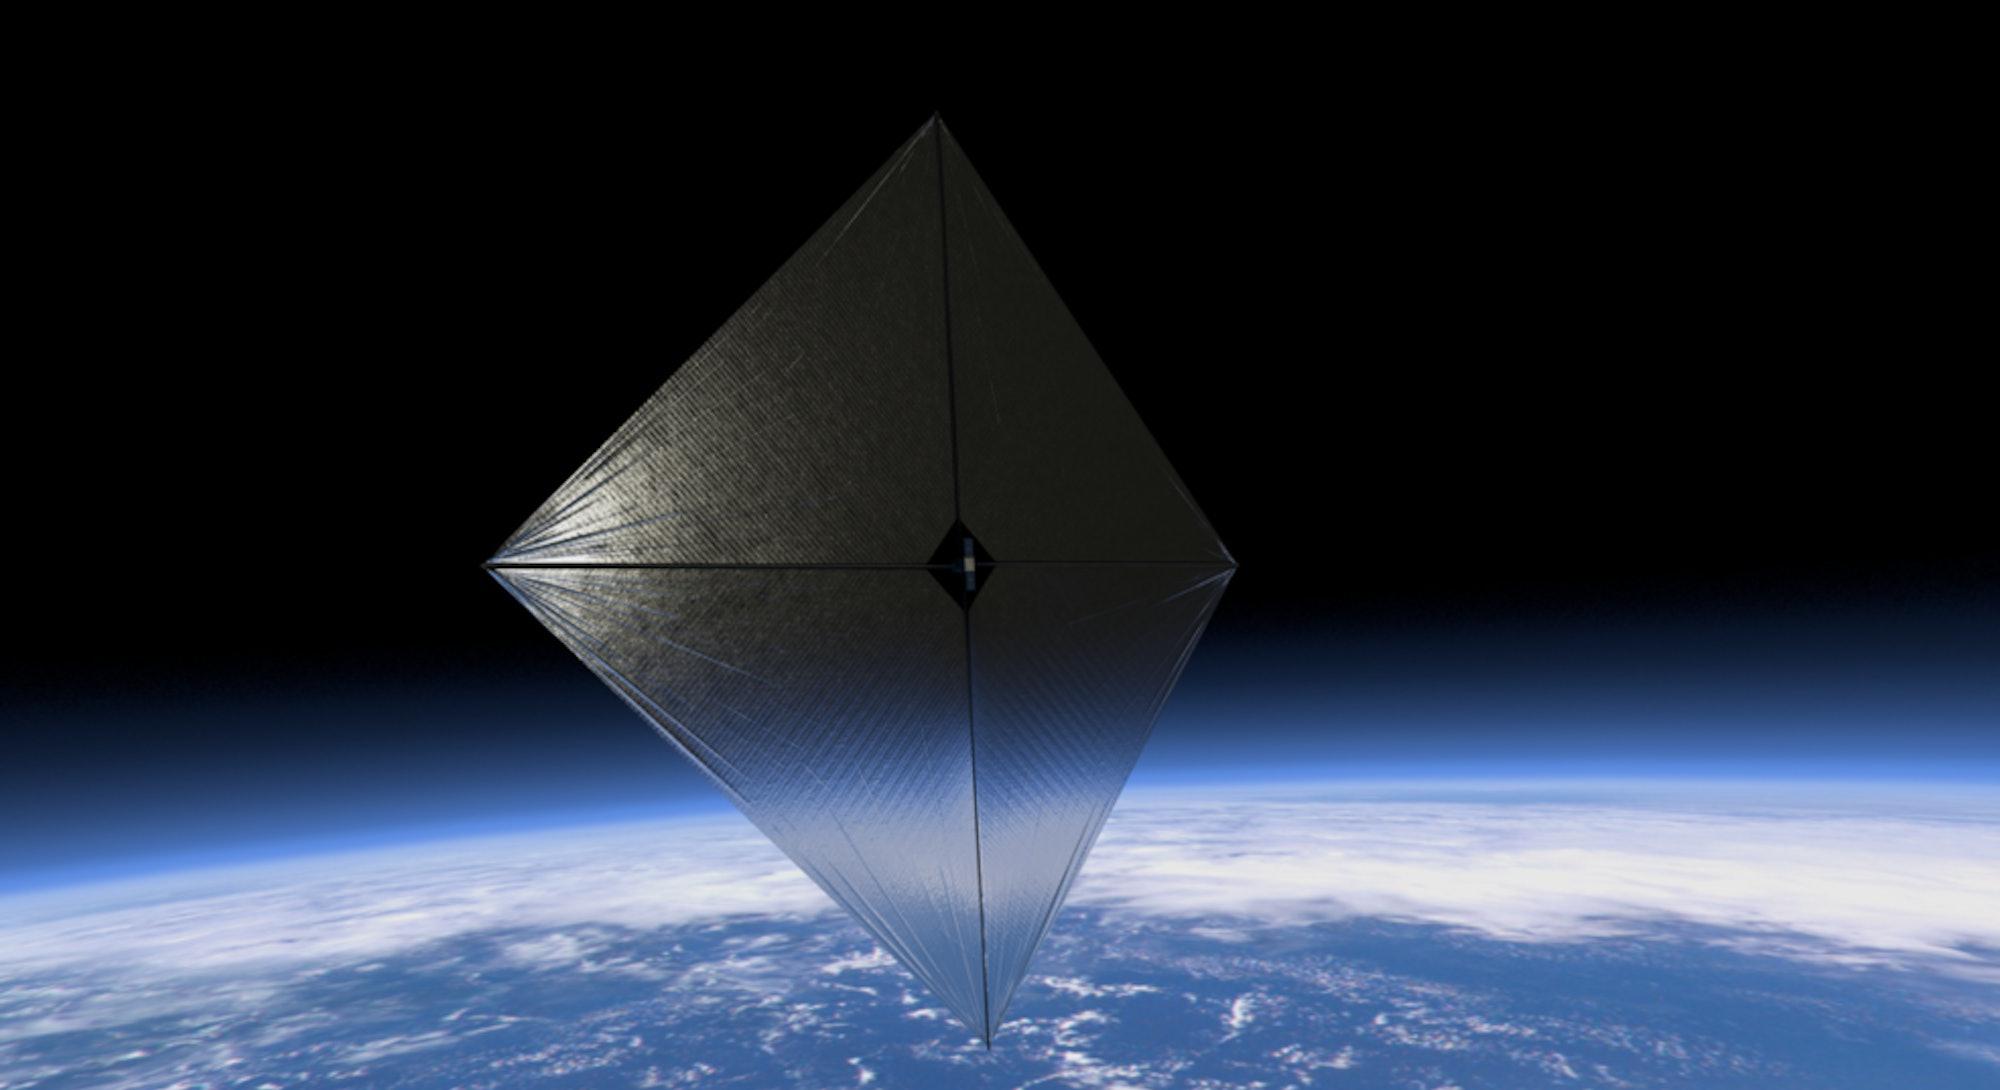 A metallic sun sail floating above Earth